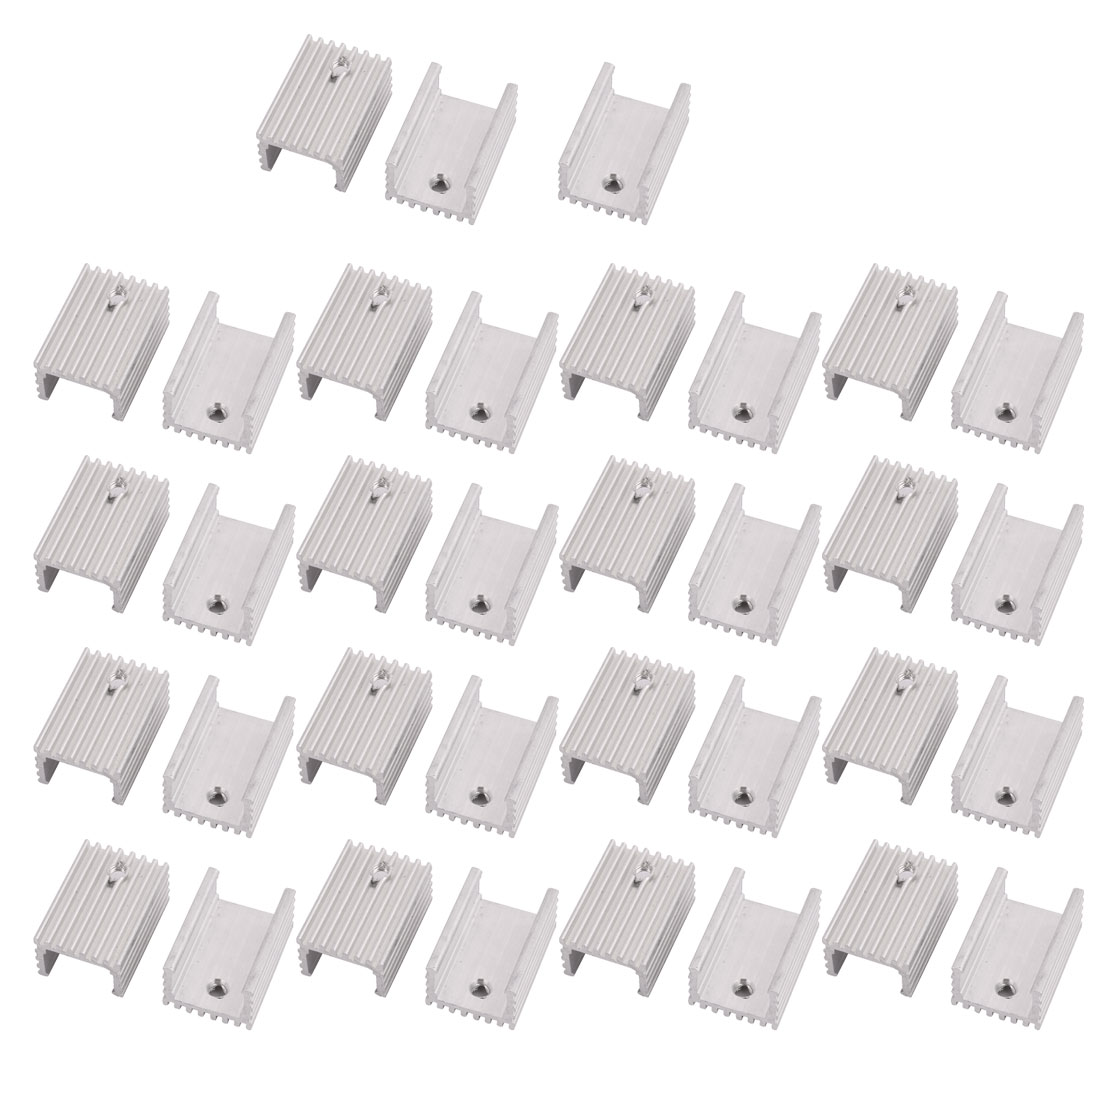 35Pcs Aluminum Screw Mount Heat Sink Cooling Fin Heatsink Silver Tone 15x10x22mm